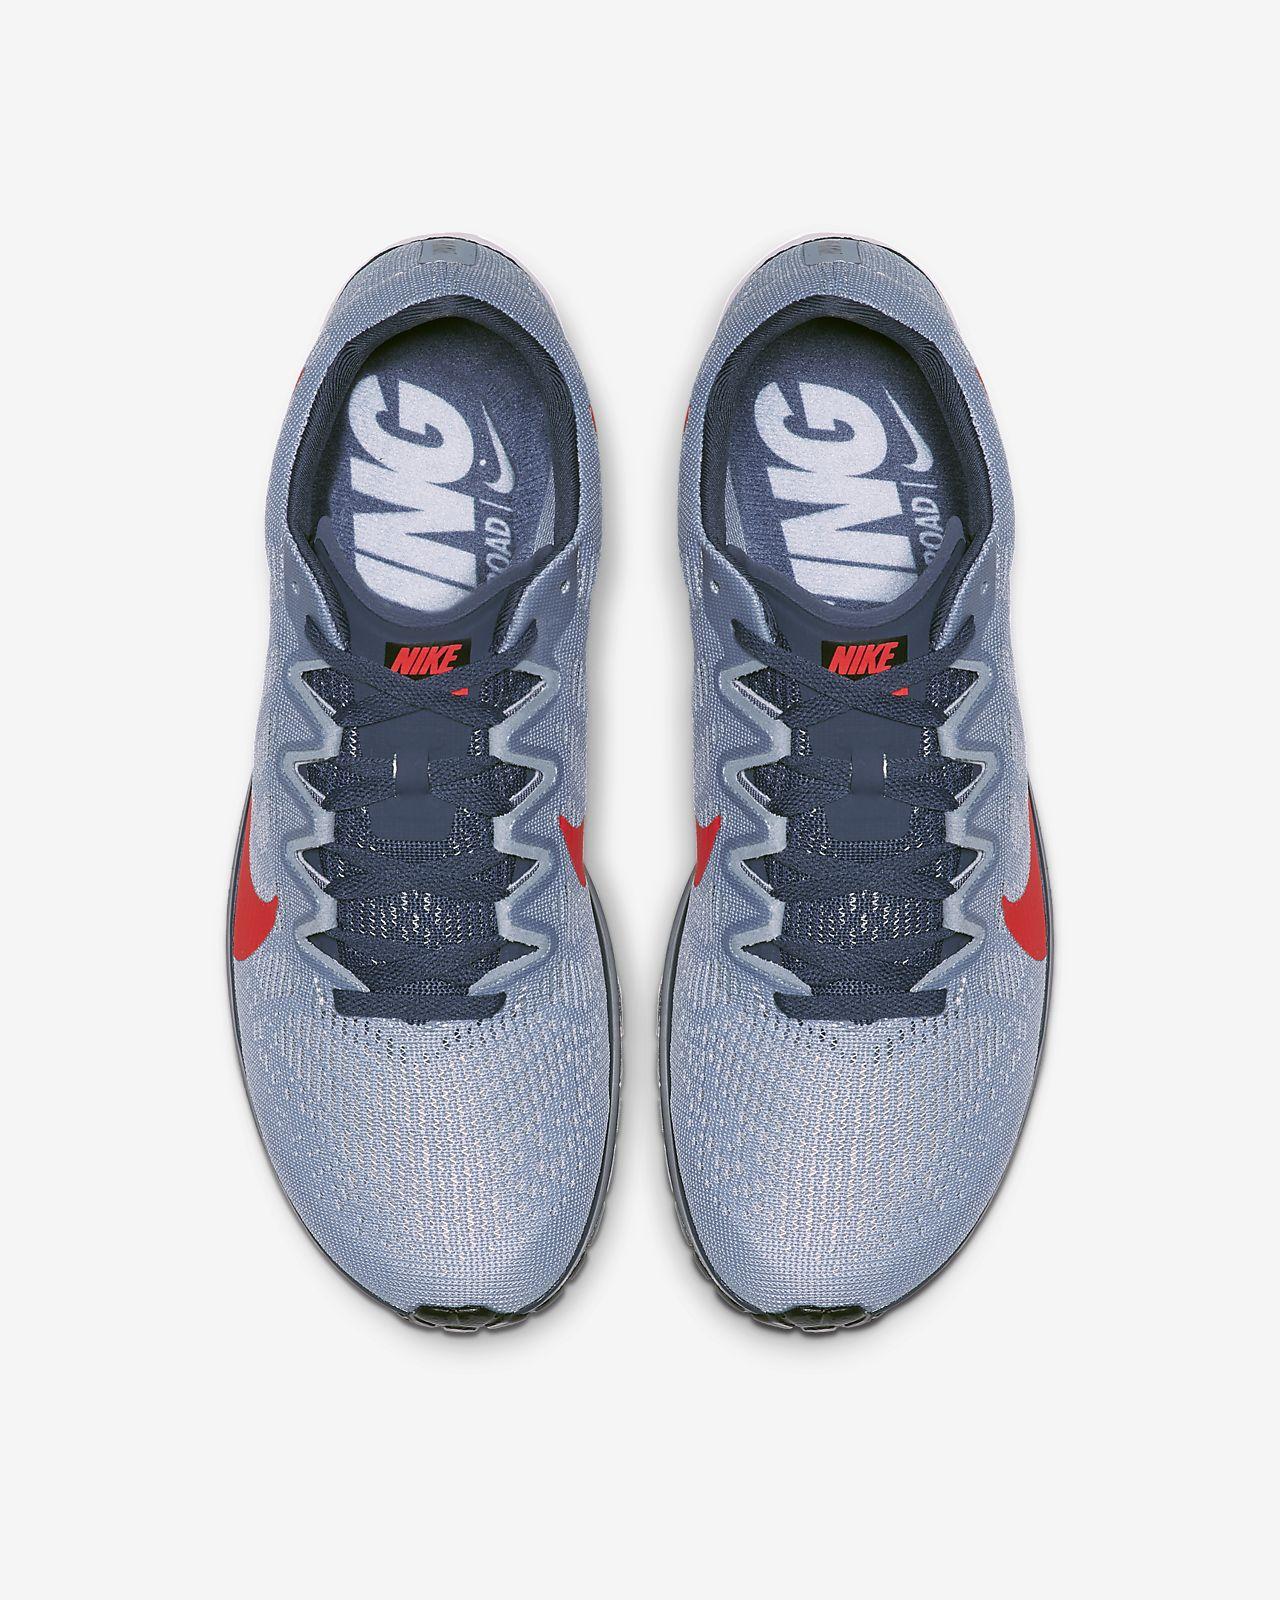 70cc81ec60388 Calzado de running Nike Air Zoom Streak 7. Nike.com CL